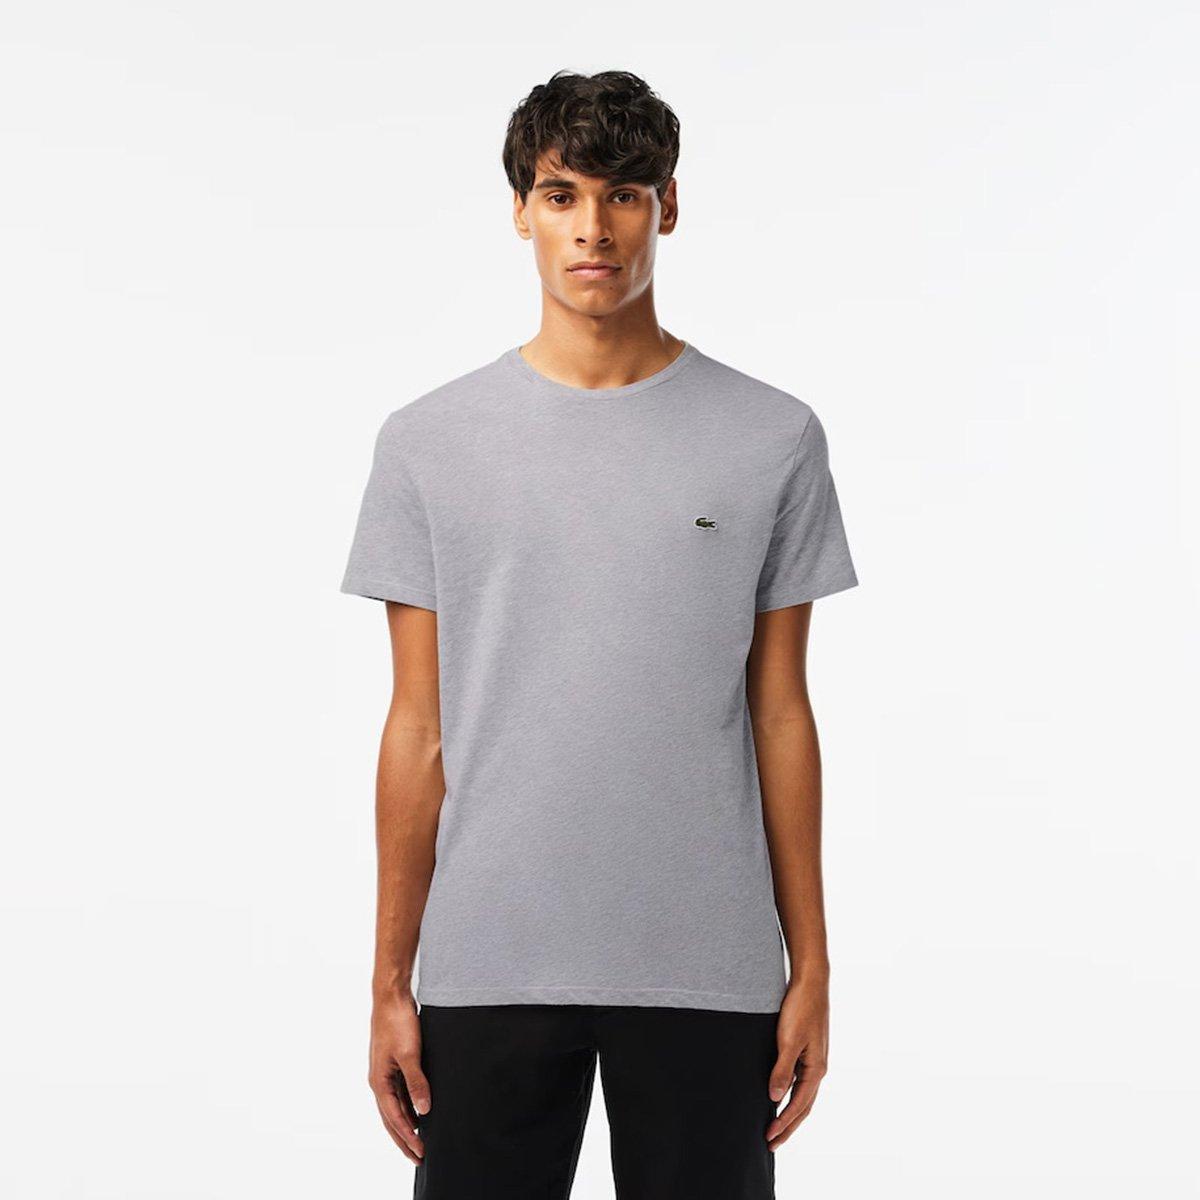 6a7312eb54ef1 Camiseta Lacoste Básica Jersey Masculina